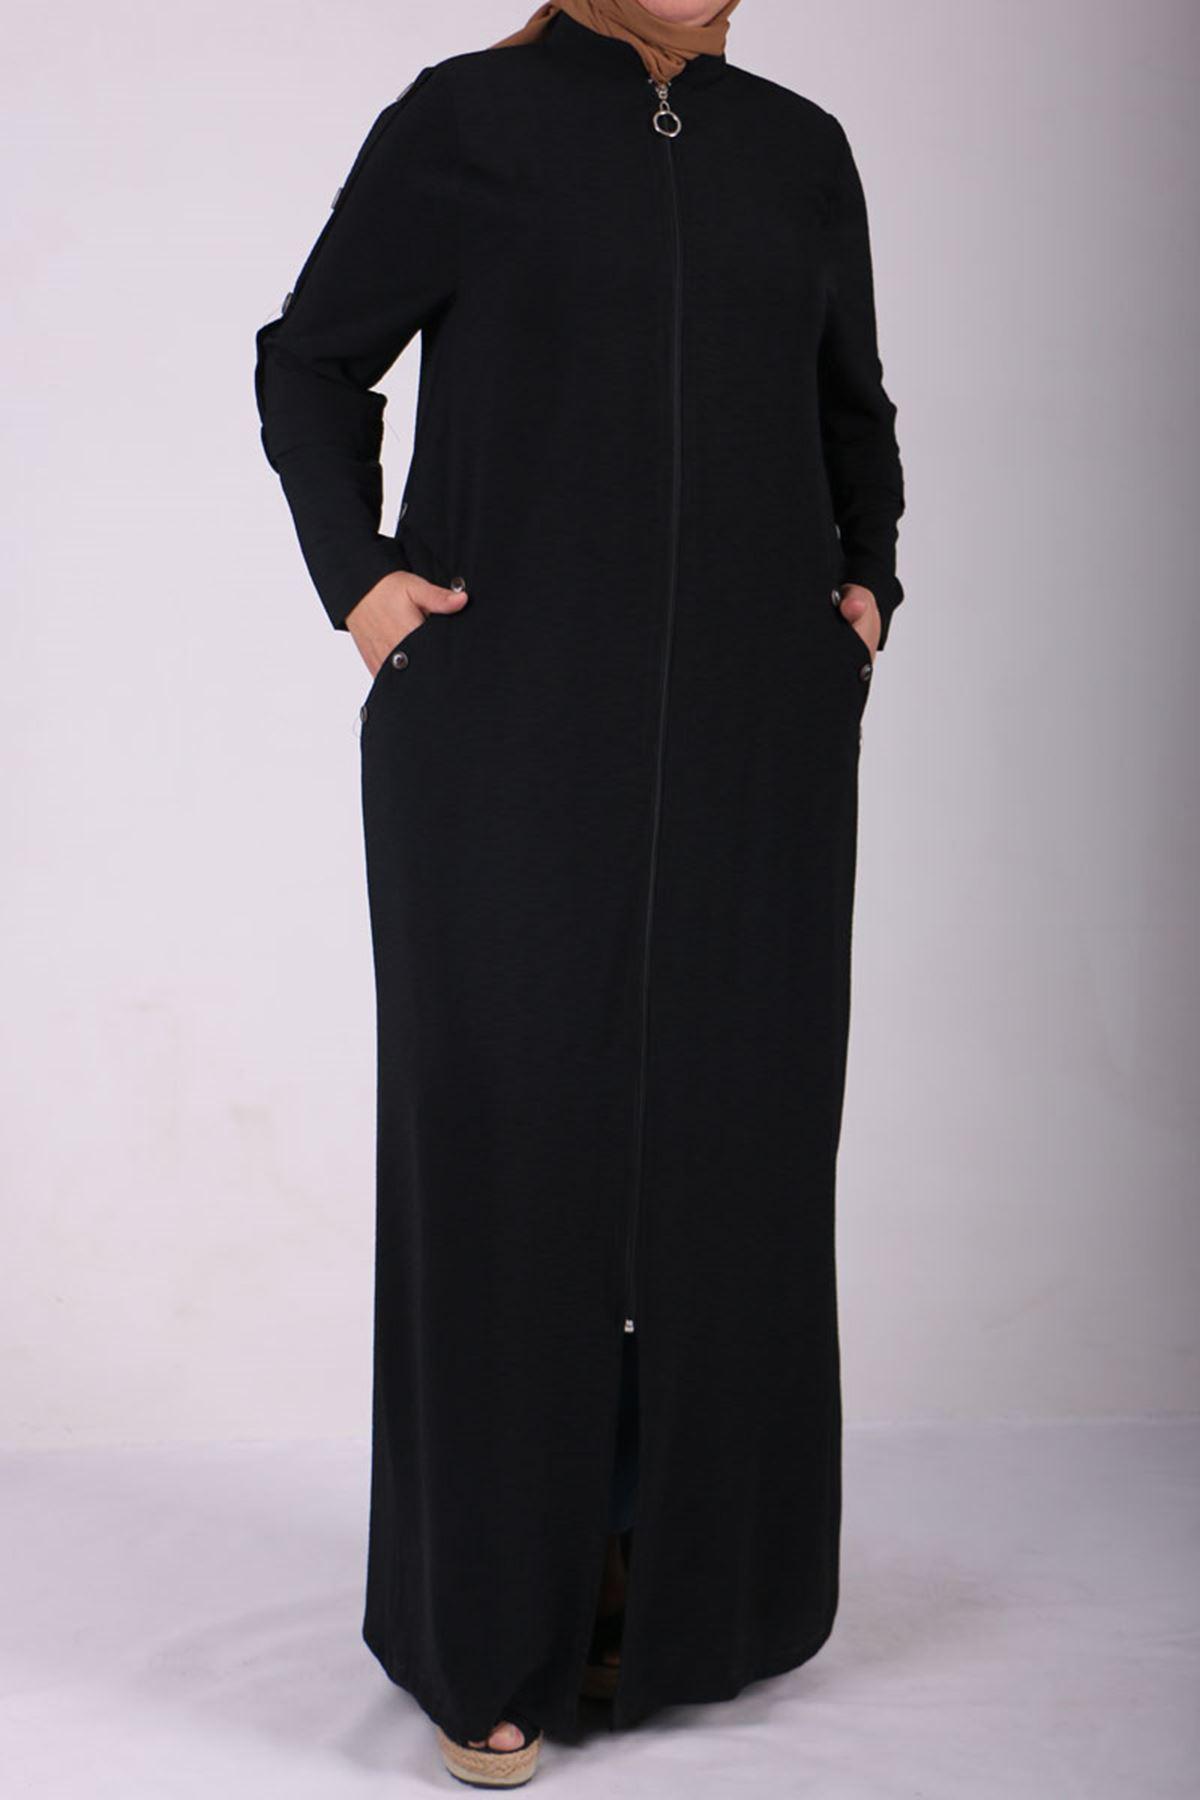 6036 Plus Size Button Detailed Topcoat-Black